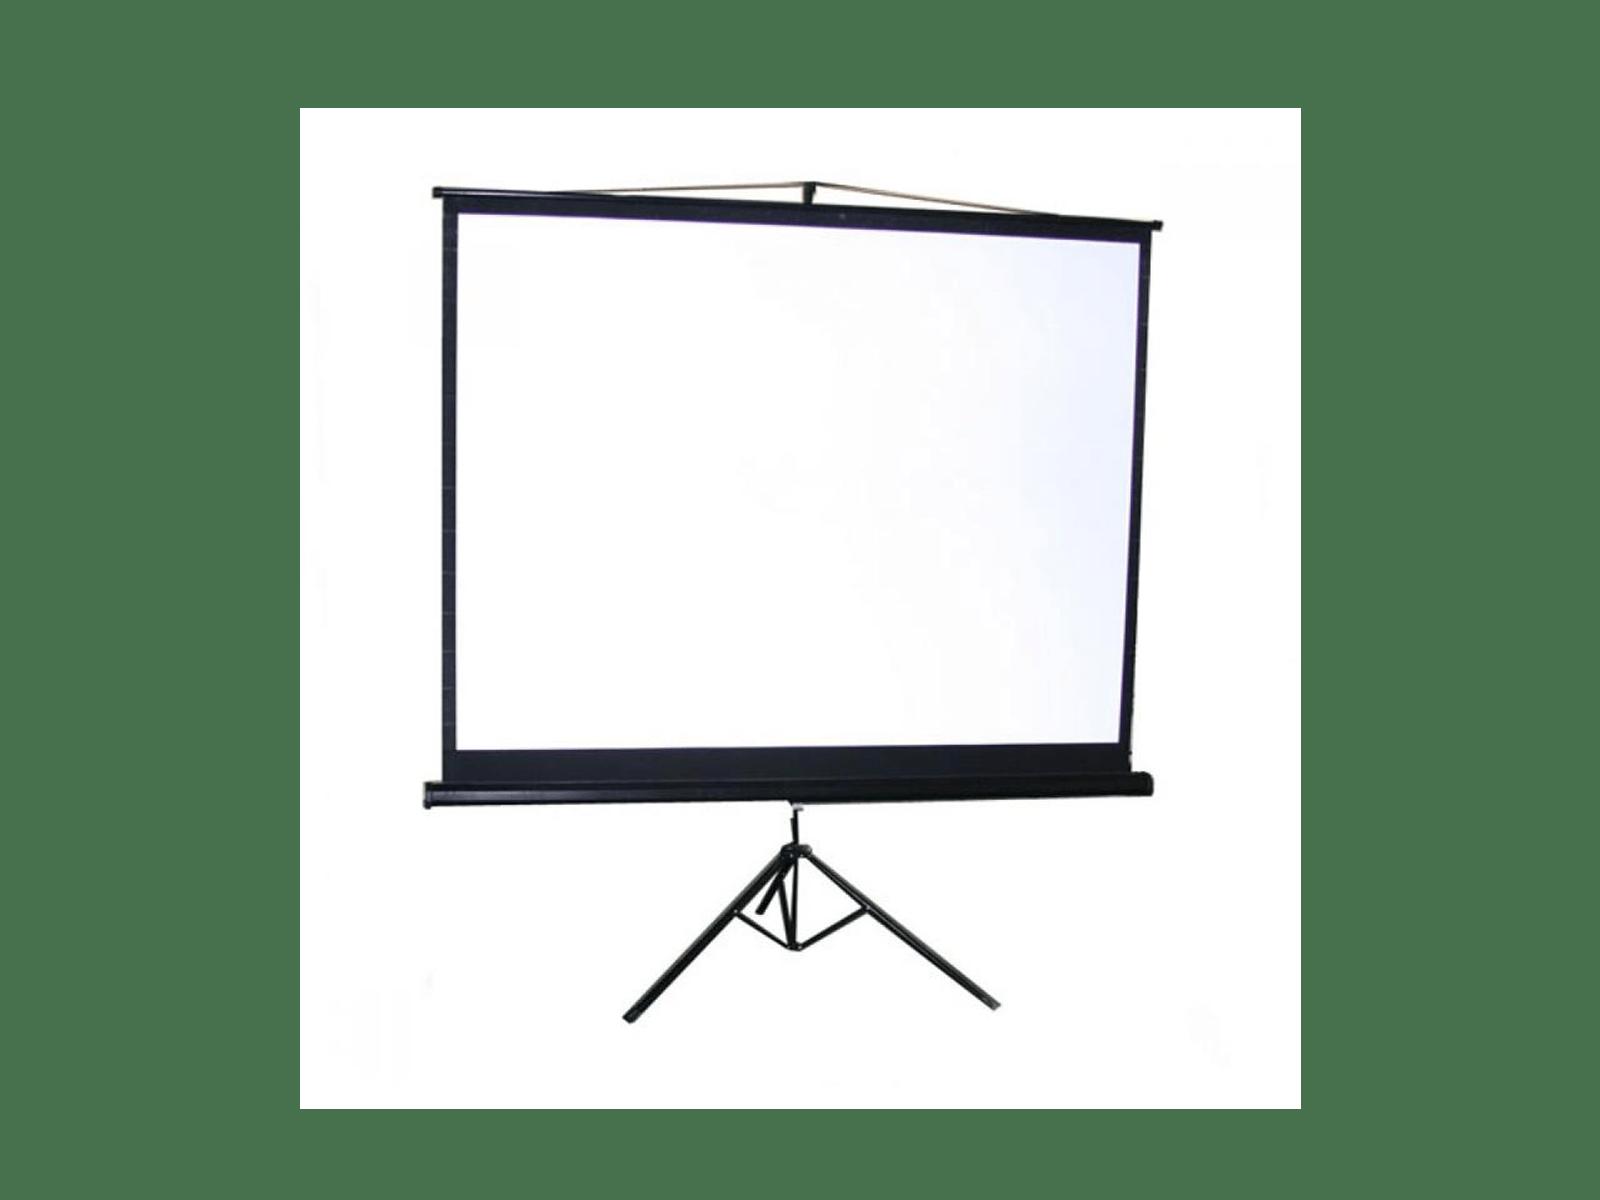 5 X 8 Projector Screen